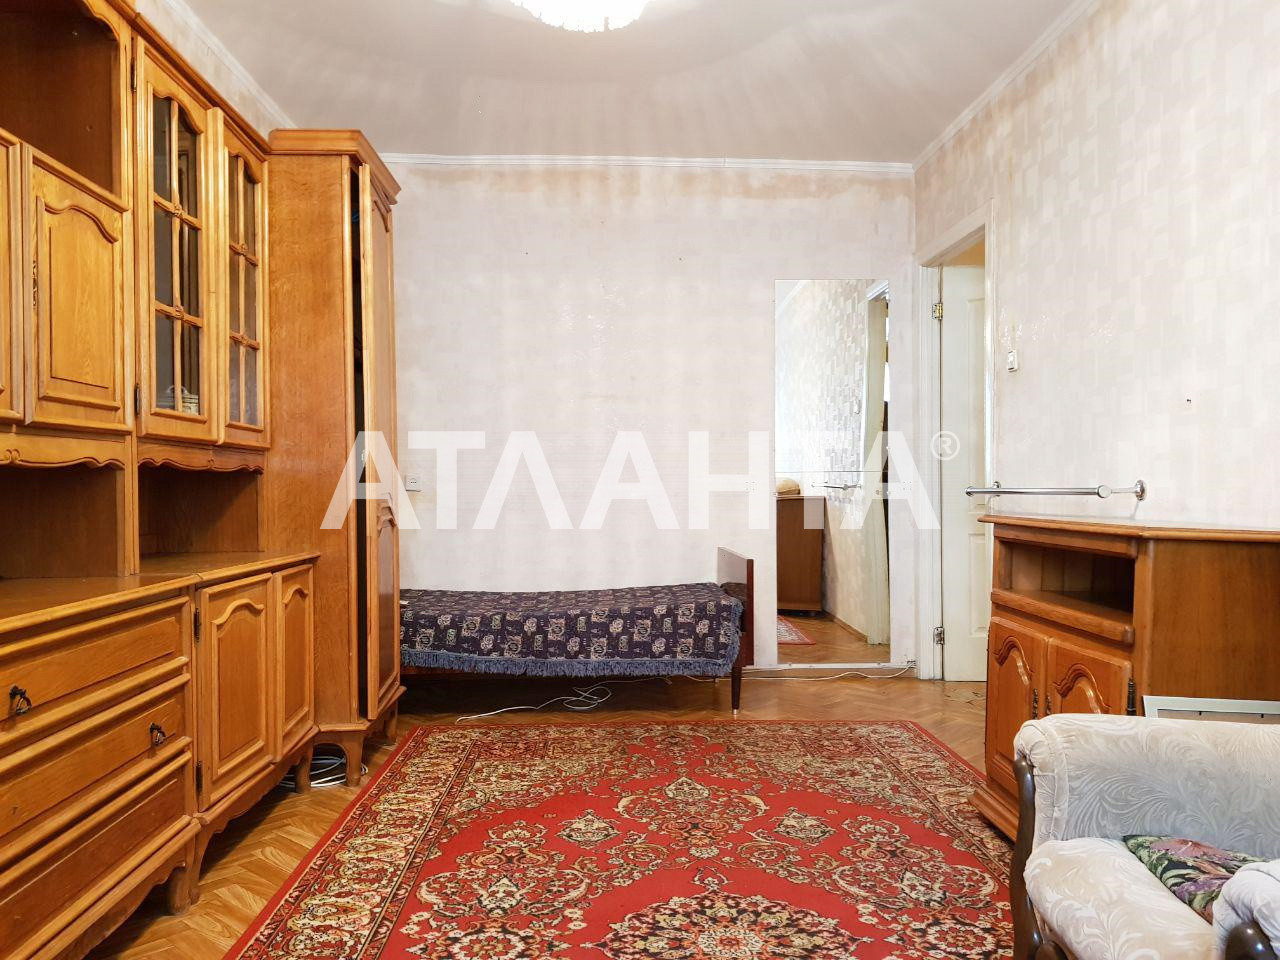 Продается 1-комнатная Квартира на ул. Шевченко Пр. — 31 000 у.е. (фото №2)